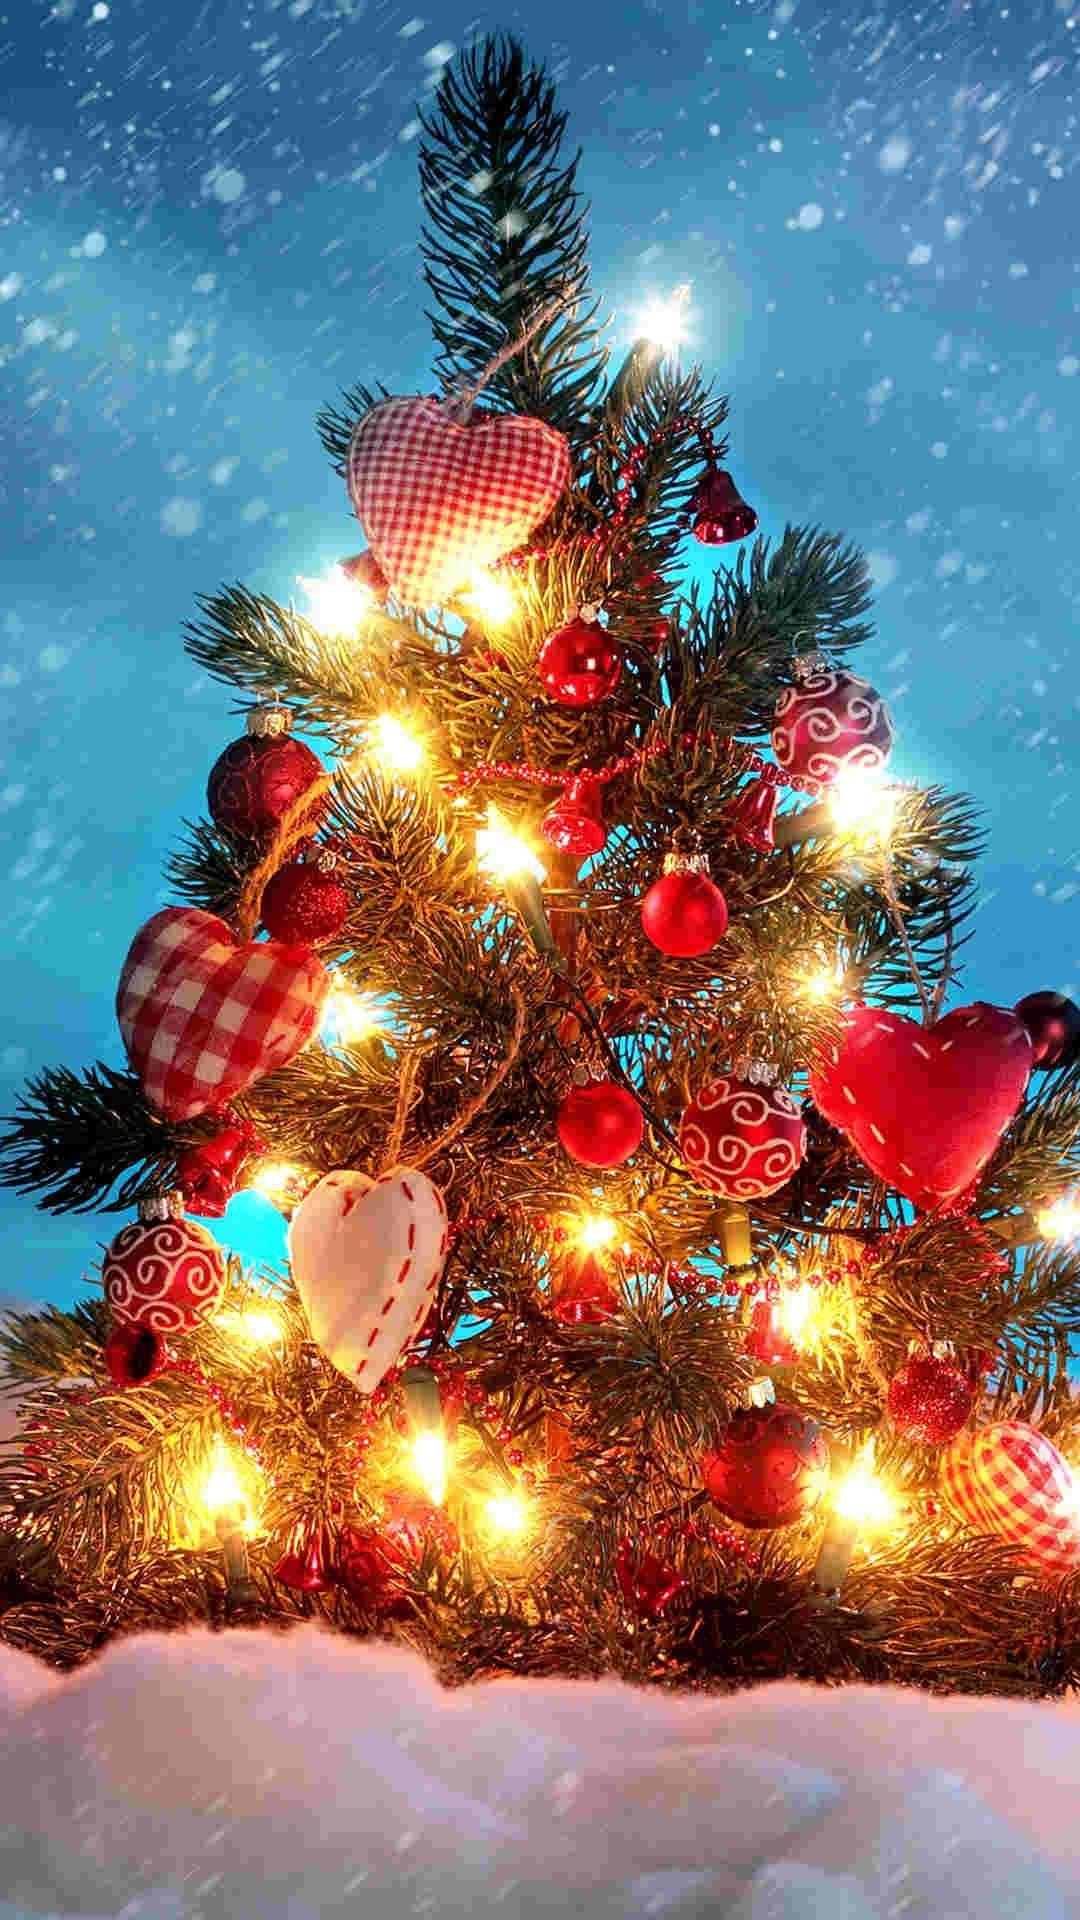 Pin On 2014 Christmas Tree Iphine 6 Plus Wallpaper